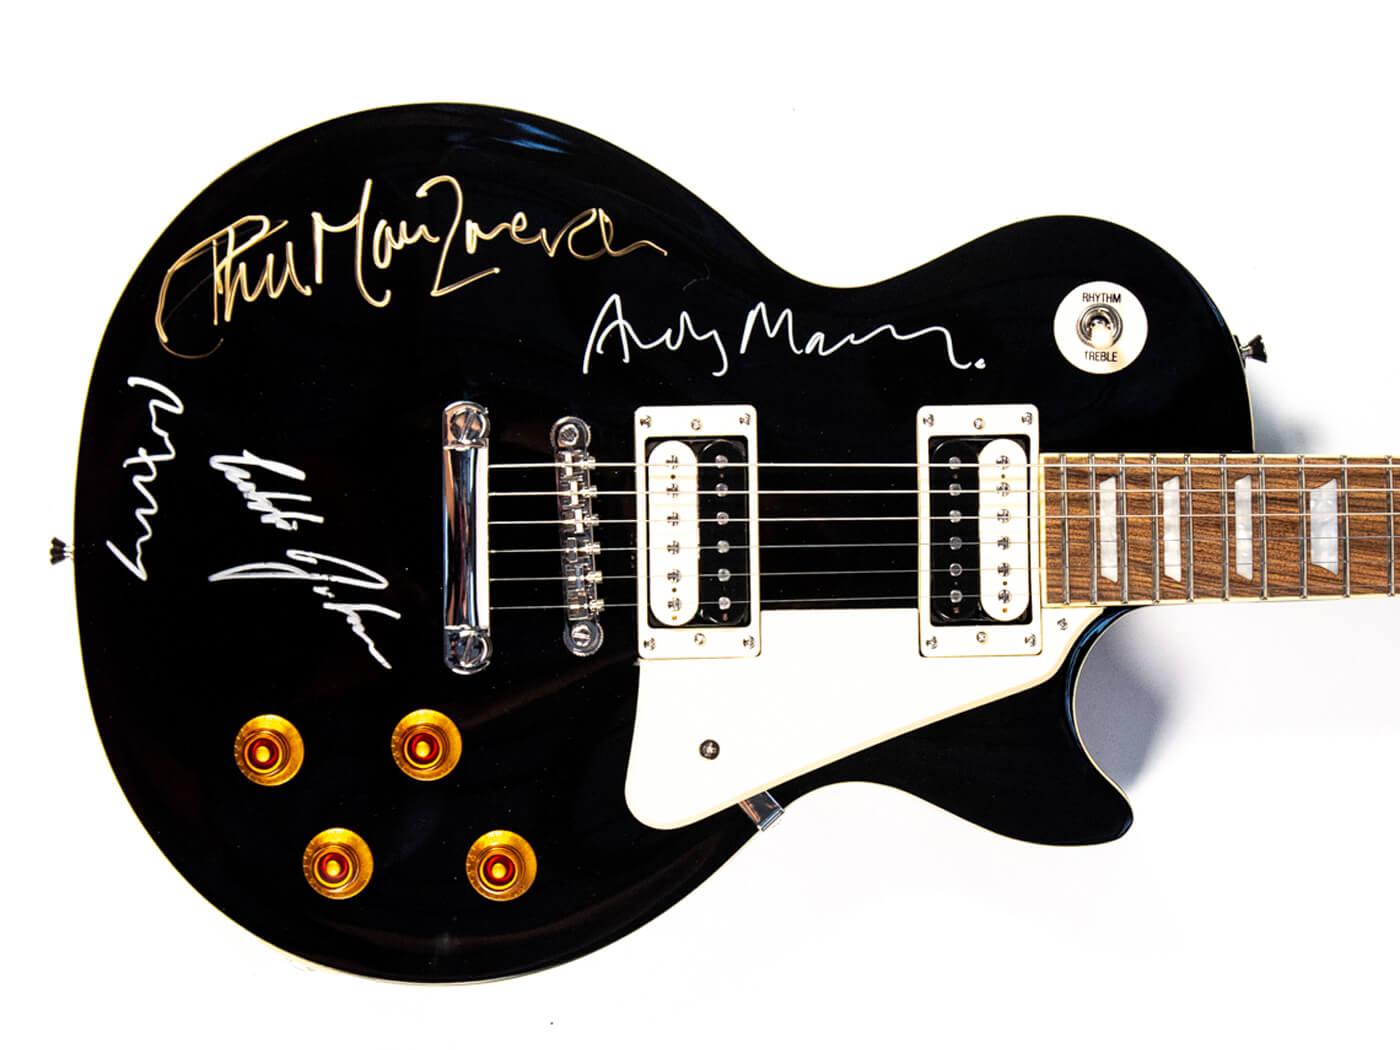 Rock Hall signed Roxy Music